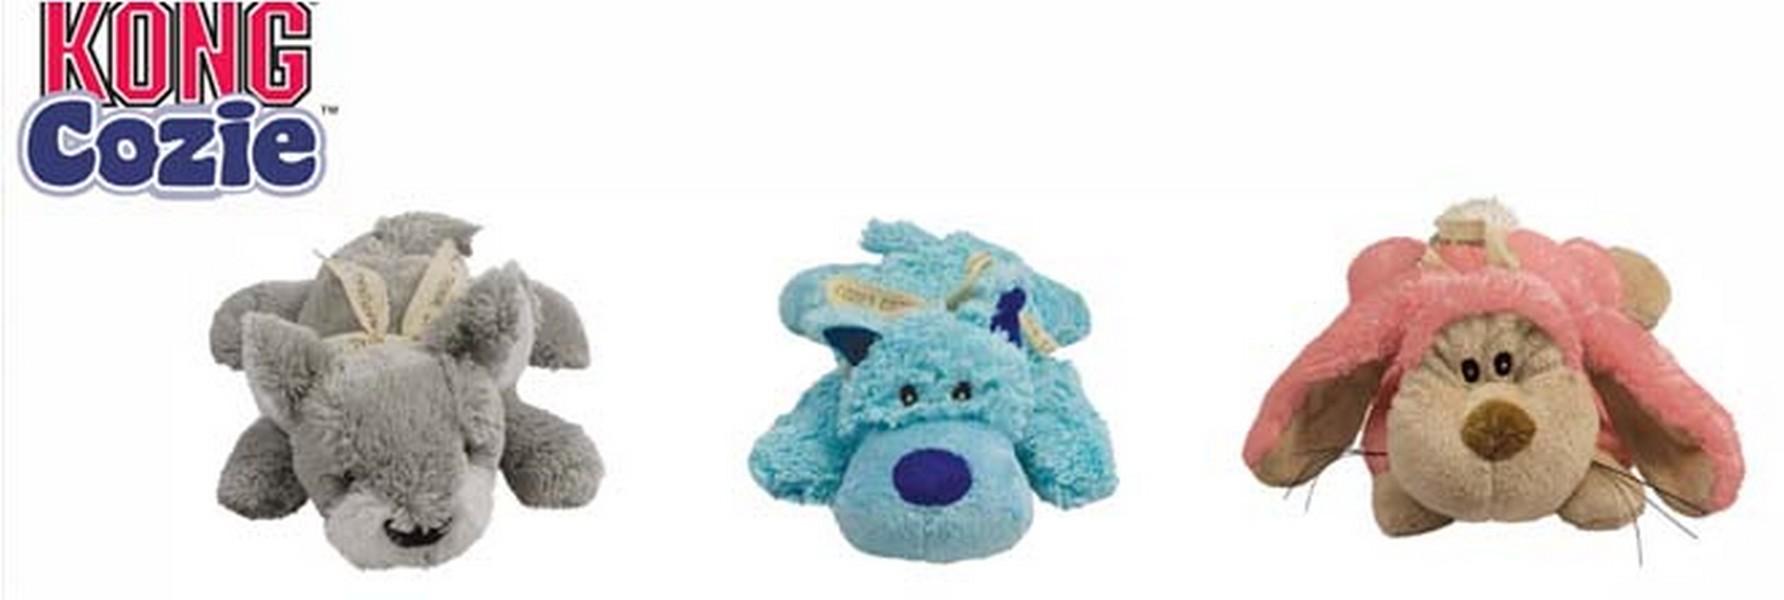 Kong Cozie Pastel / Игрушка Конг для собак Волк Коала Кролик Плюш